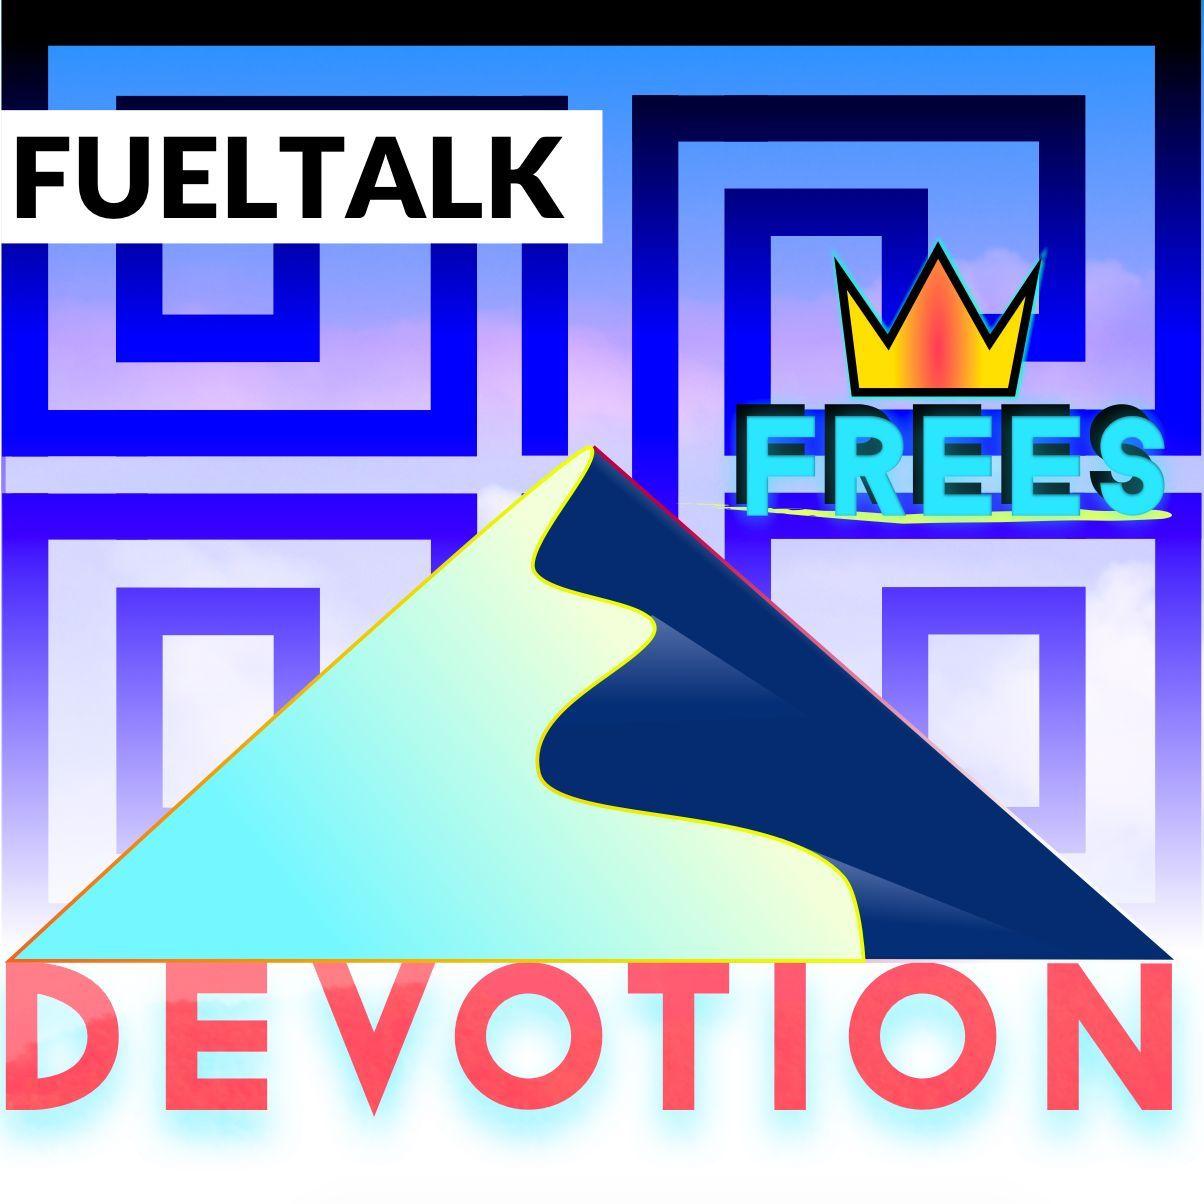 Devotion Frees Episode #65 with Jordan Bowditch